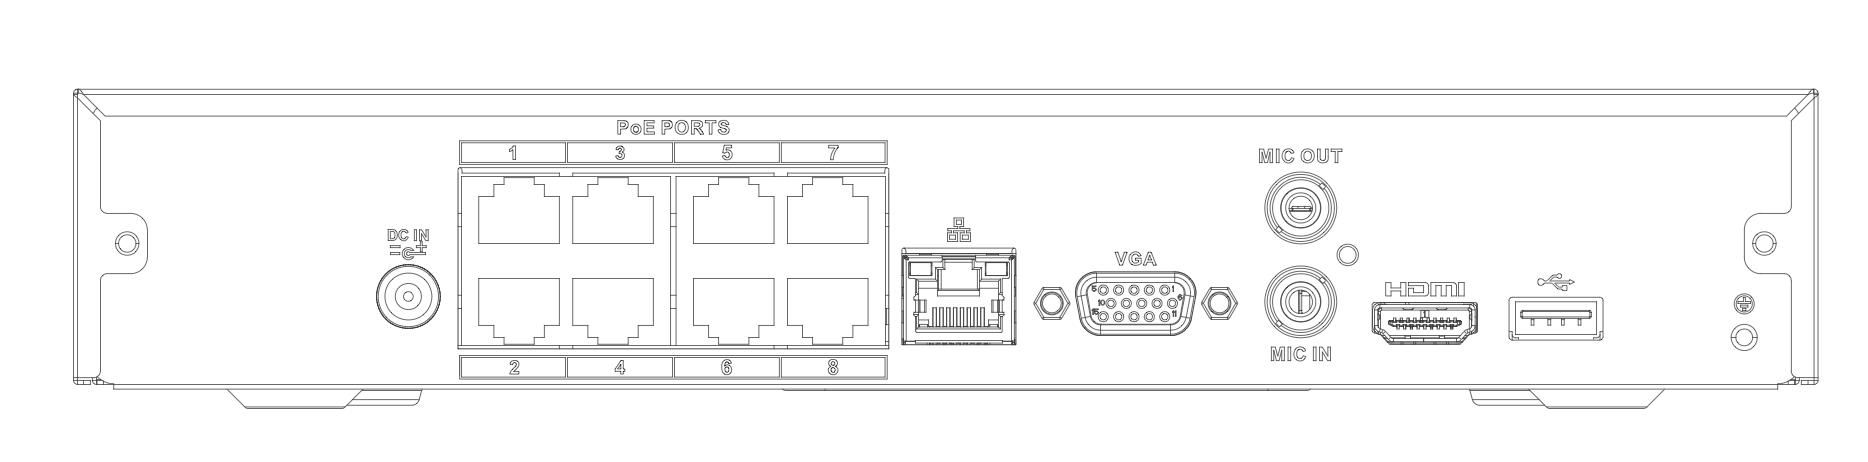 Ports de l'enregistreur NVR4108HS-8P-4KS2